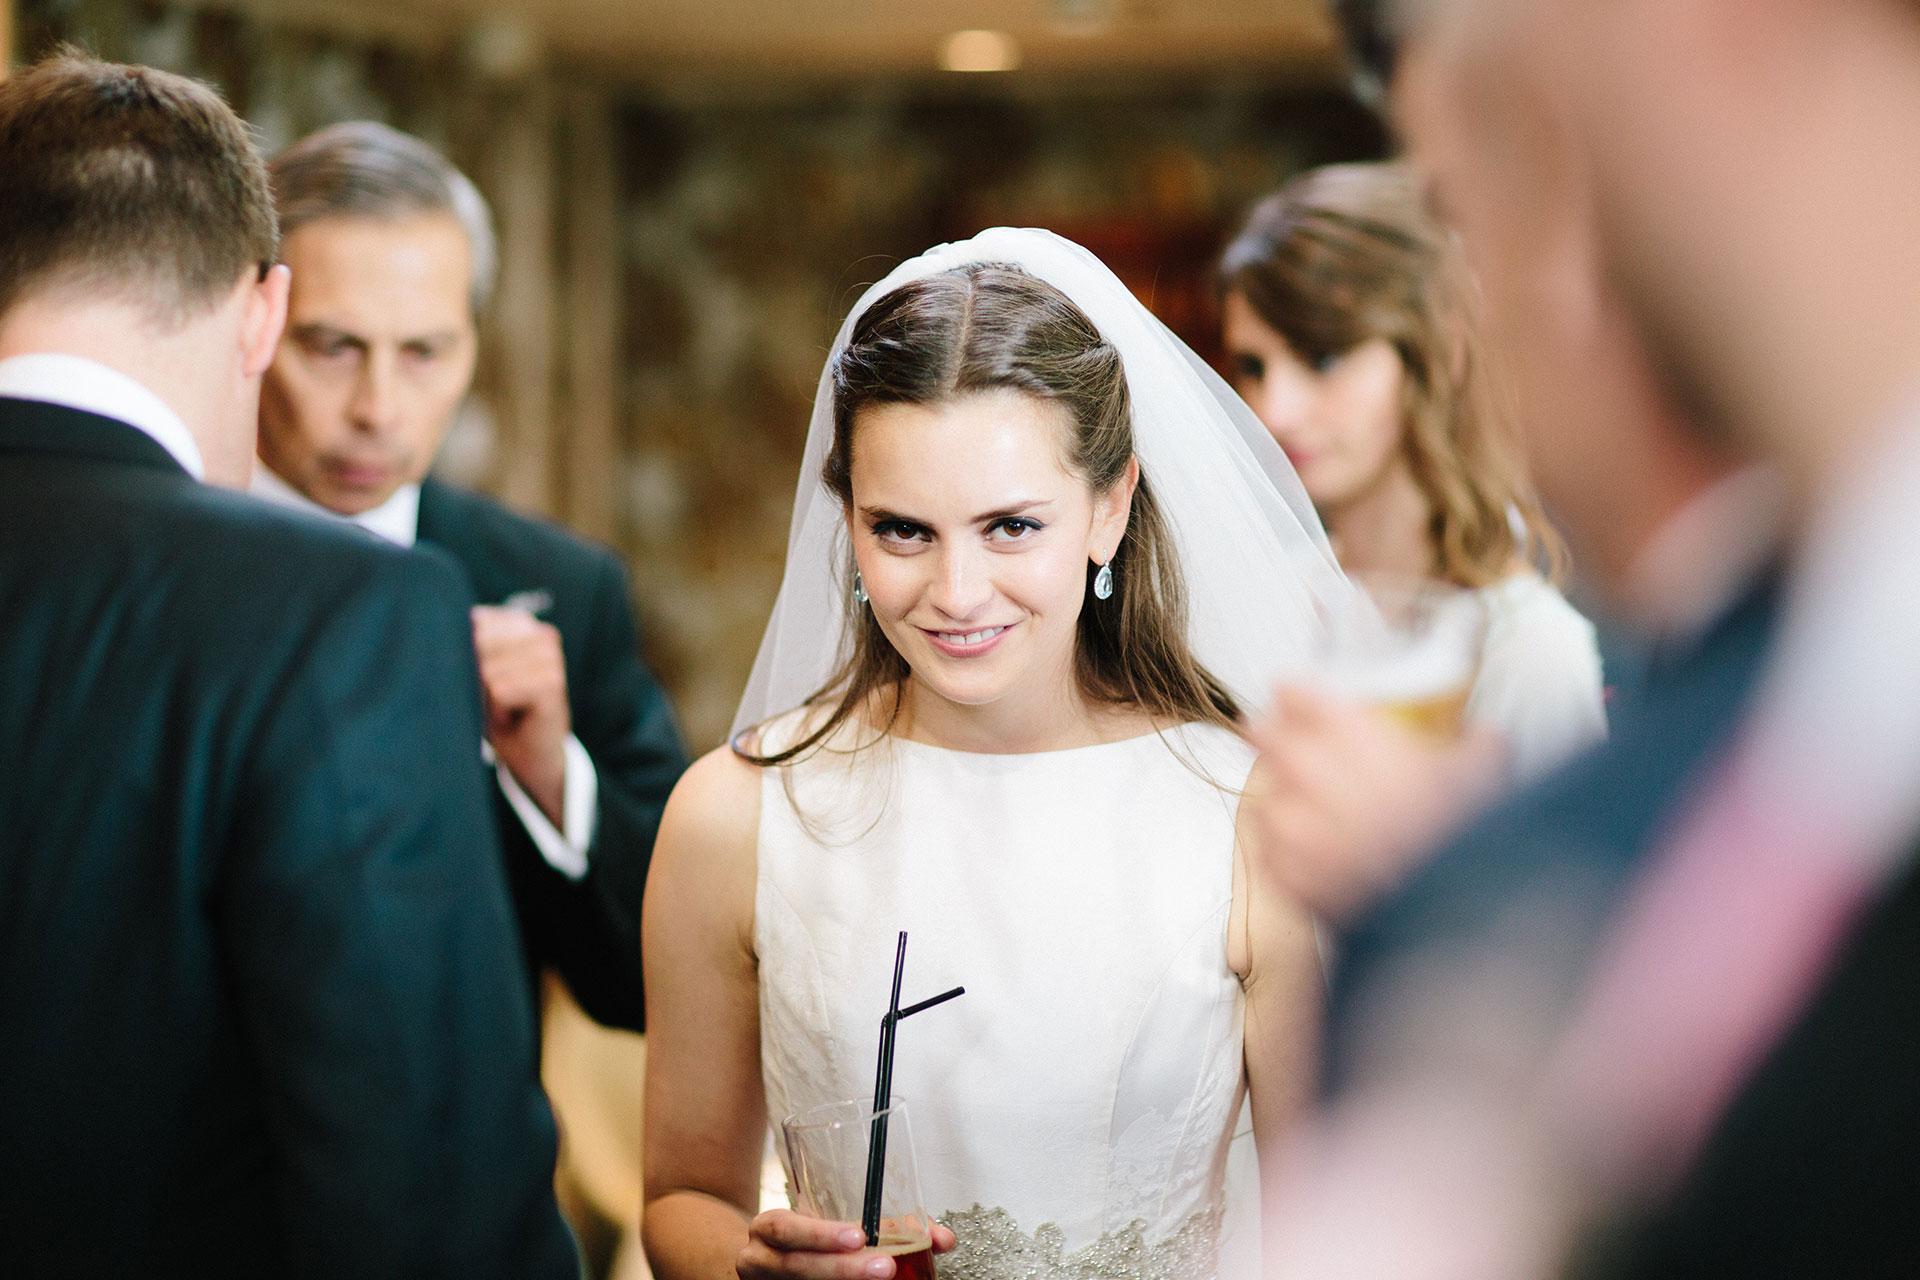 Langar-Hall-wedding-photographer-in-Nottinghamshire-Michael-Newington-Gray-52.jpg